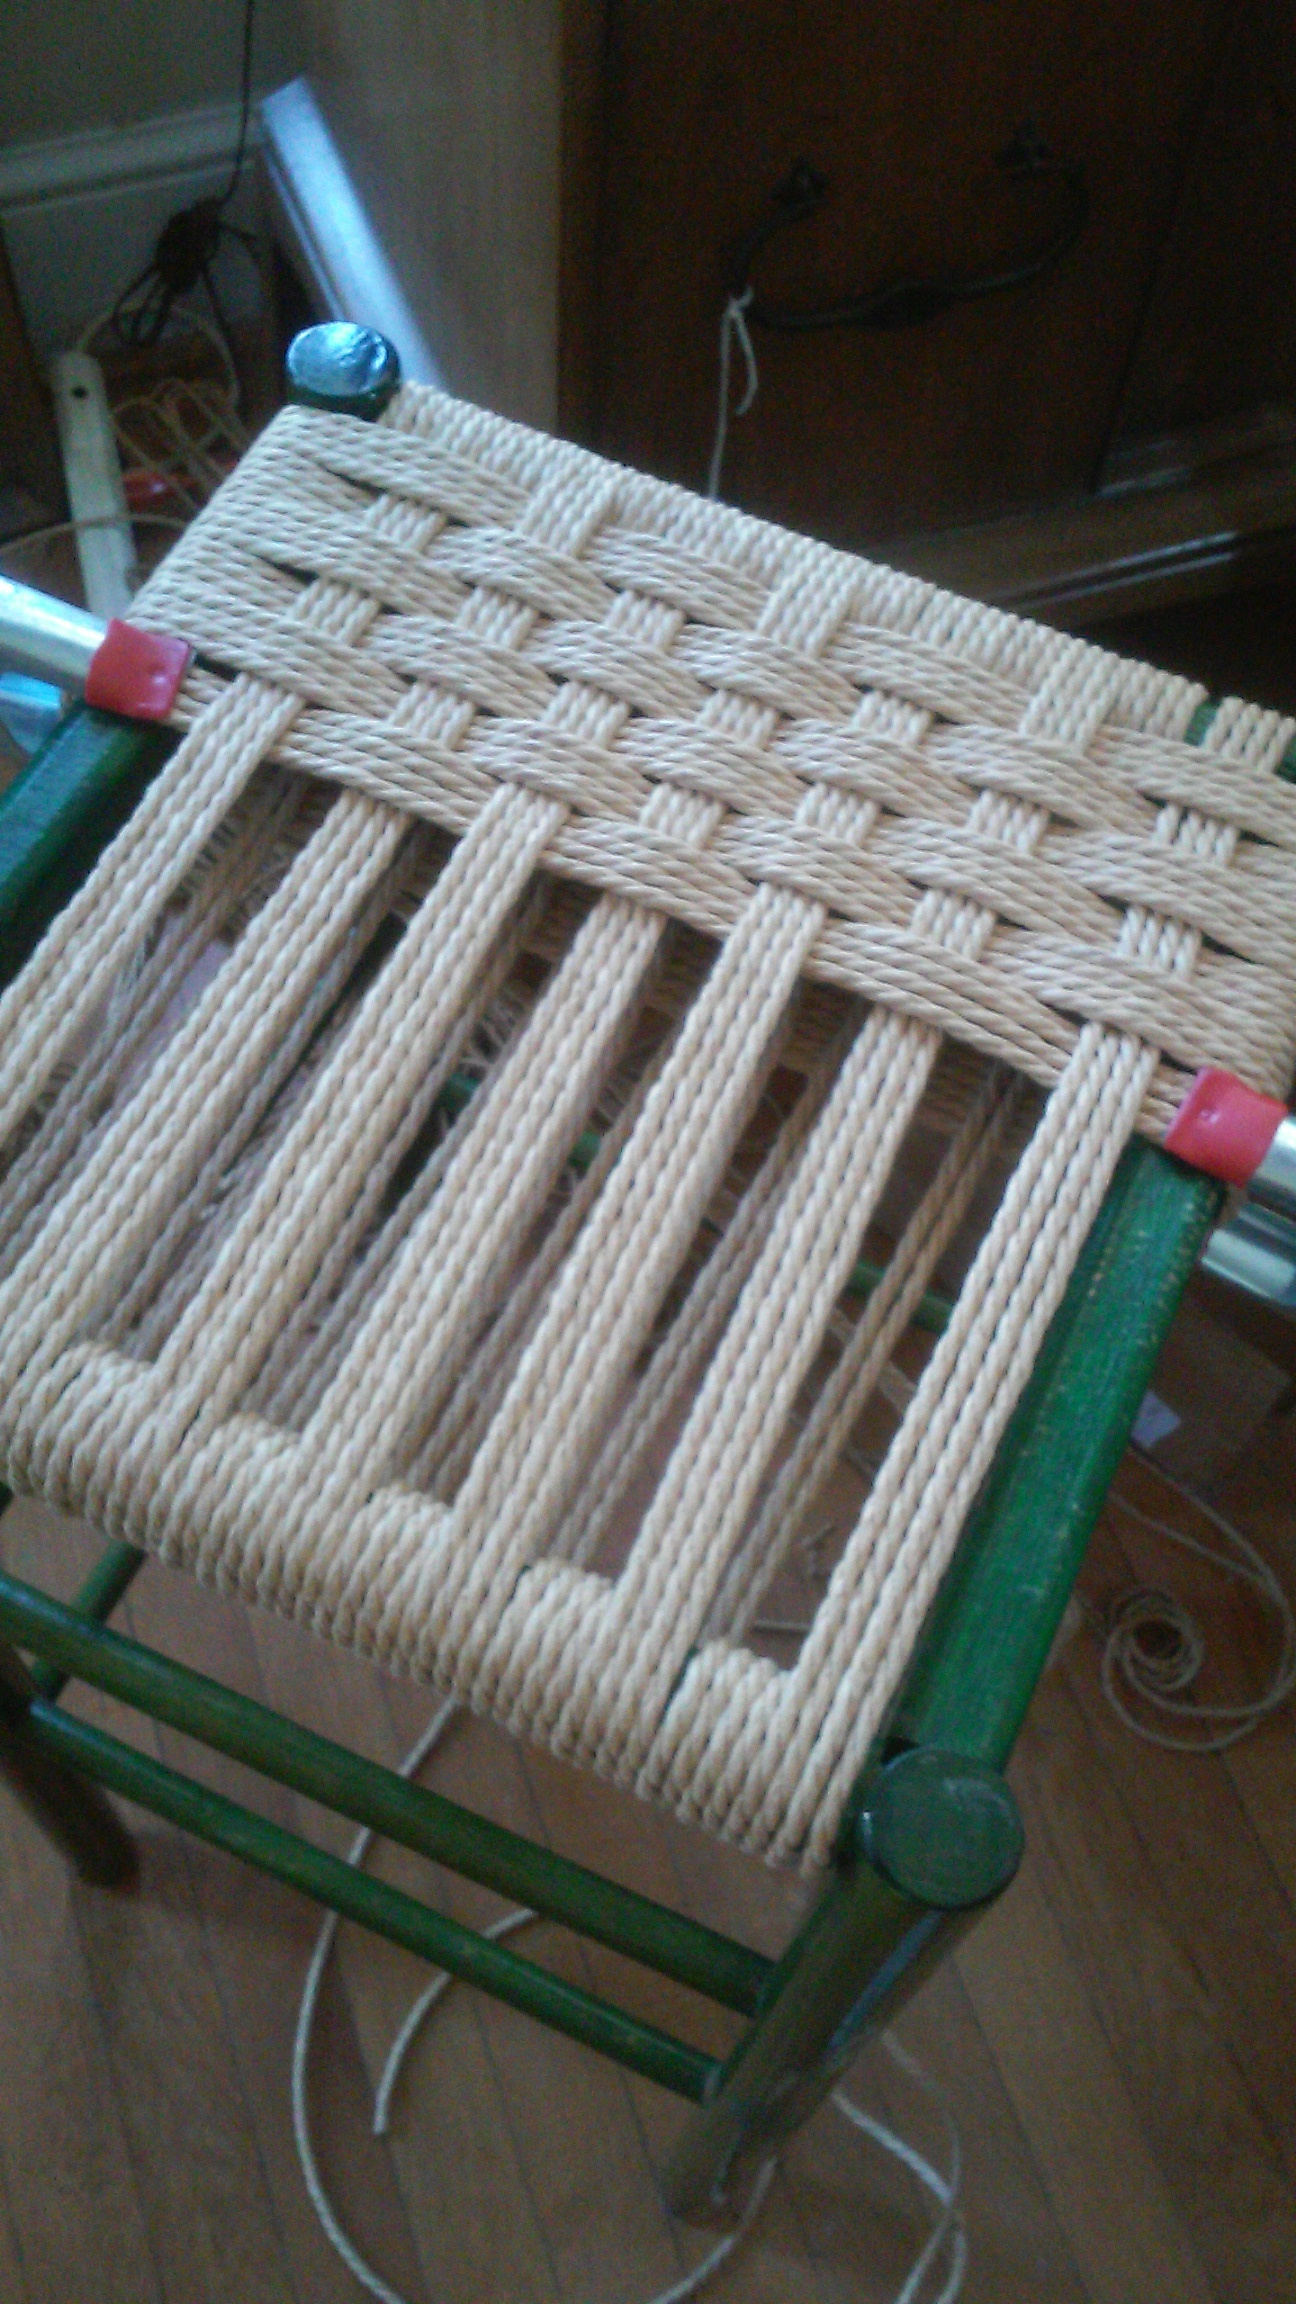 Danish Cord weave, halfway through